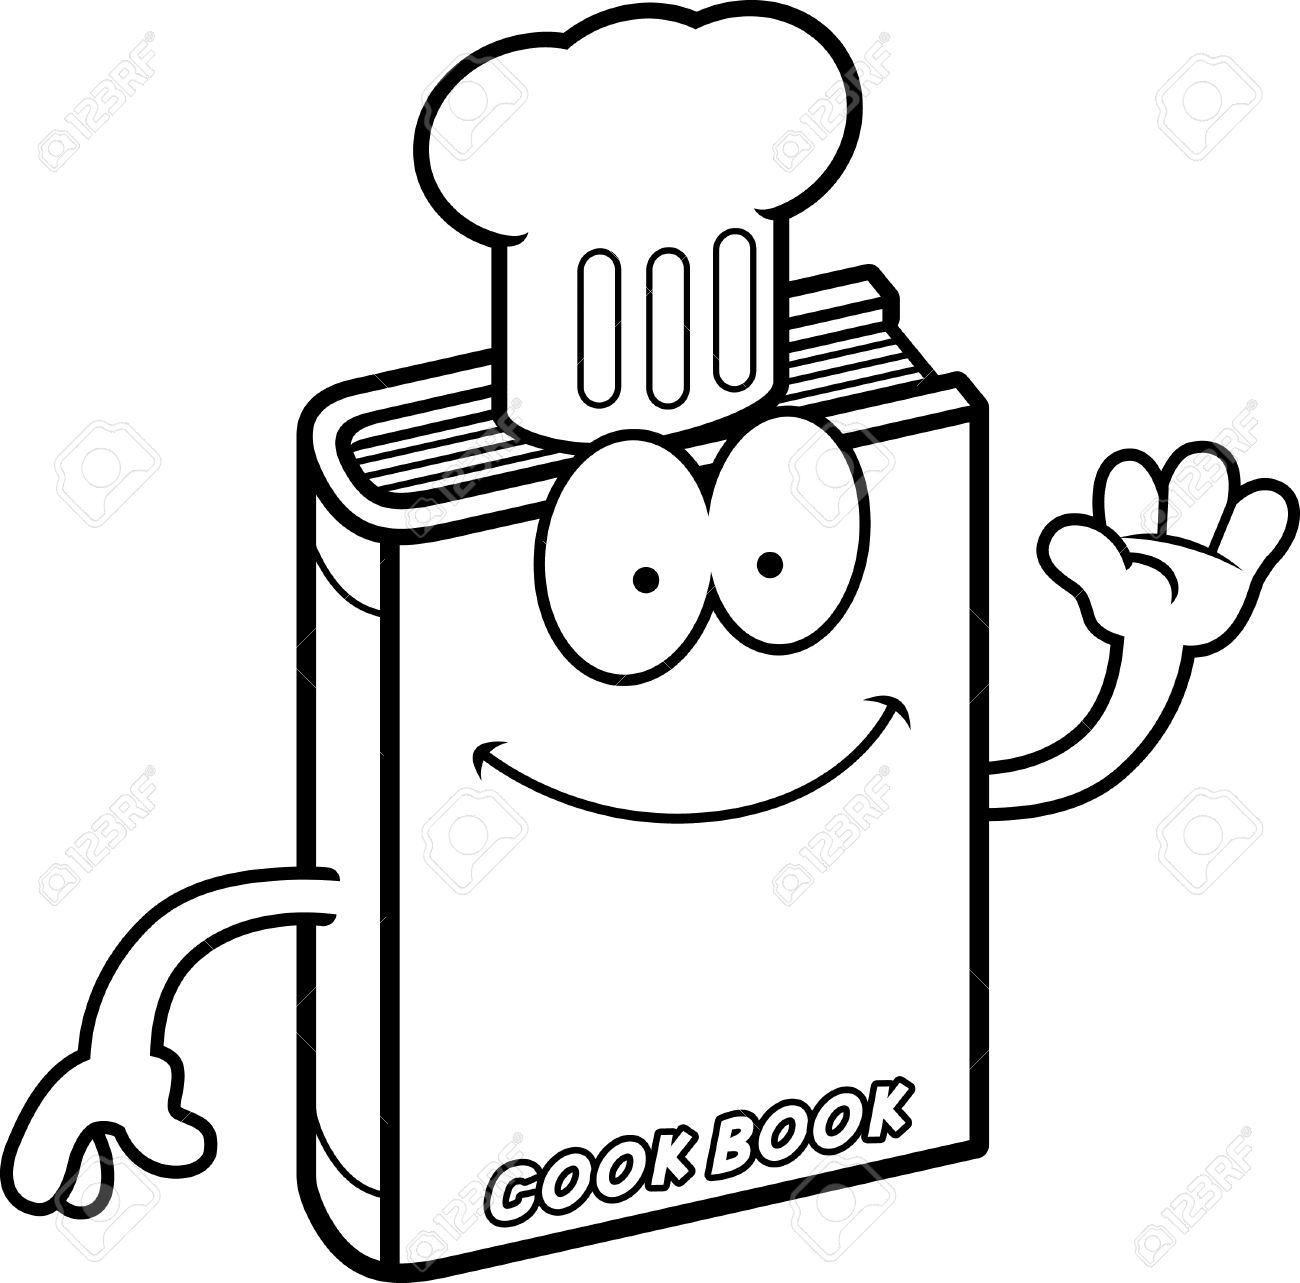 Dibujo De Cocina | Dibujos De Cocina Fabulous Utensilios De Cocina Dibujos Buscar